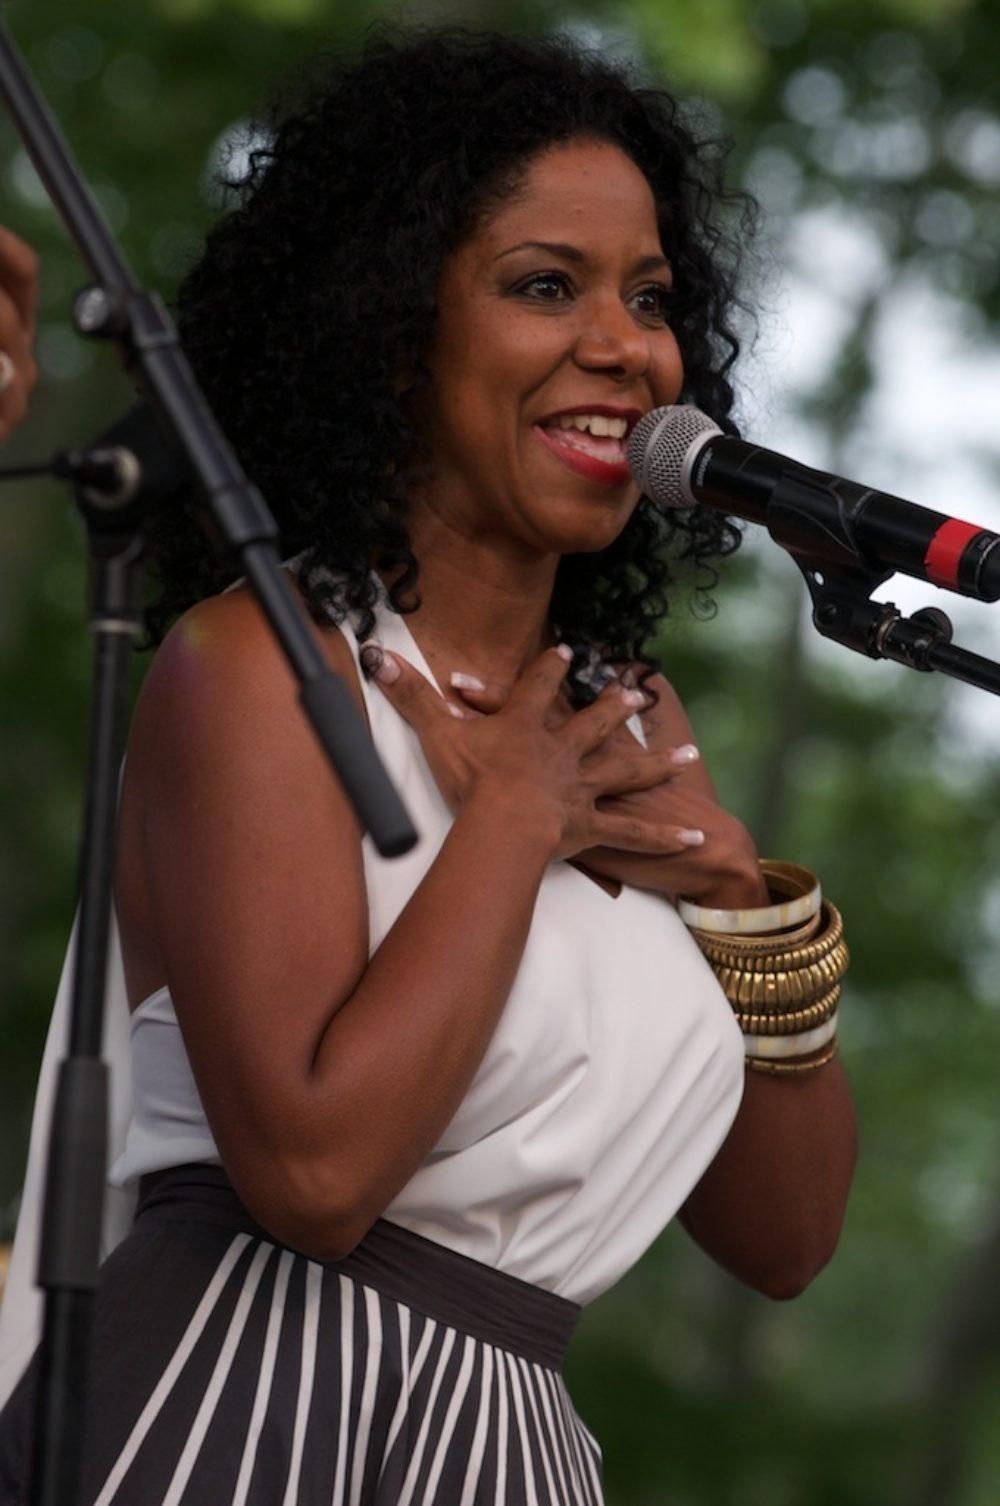 Nancy Vieira, also Central Park, 2015 (BE)